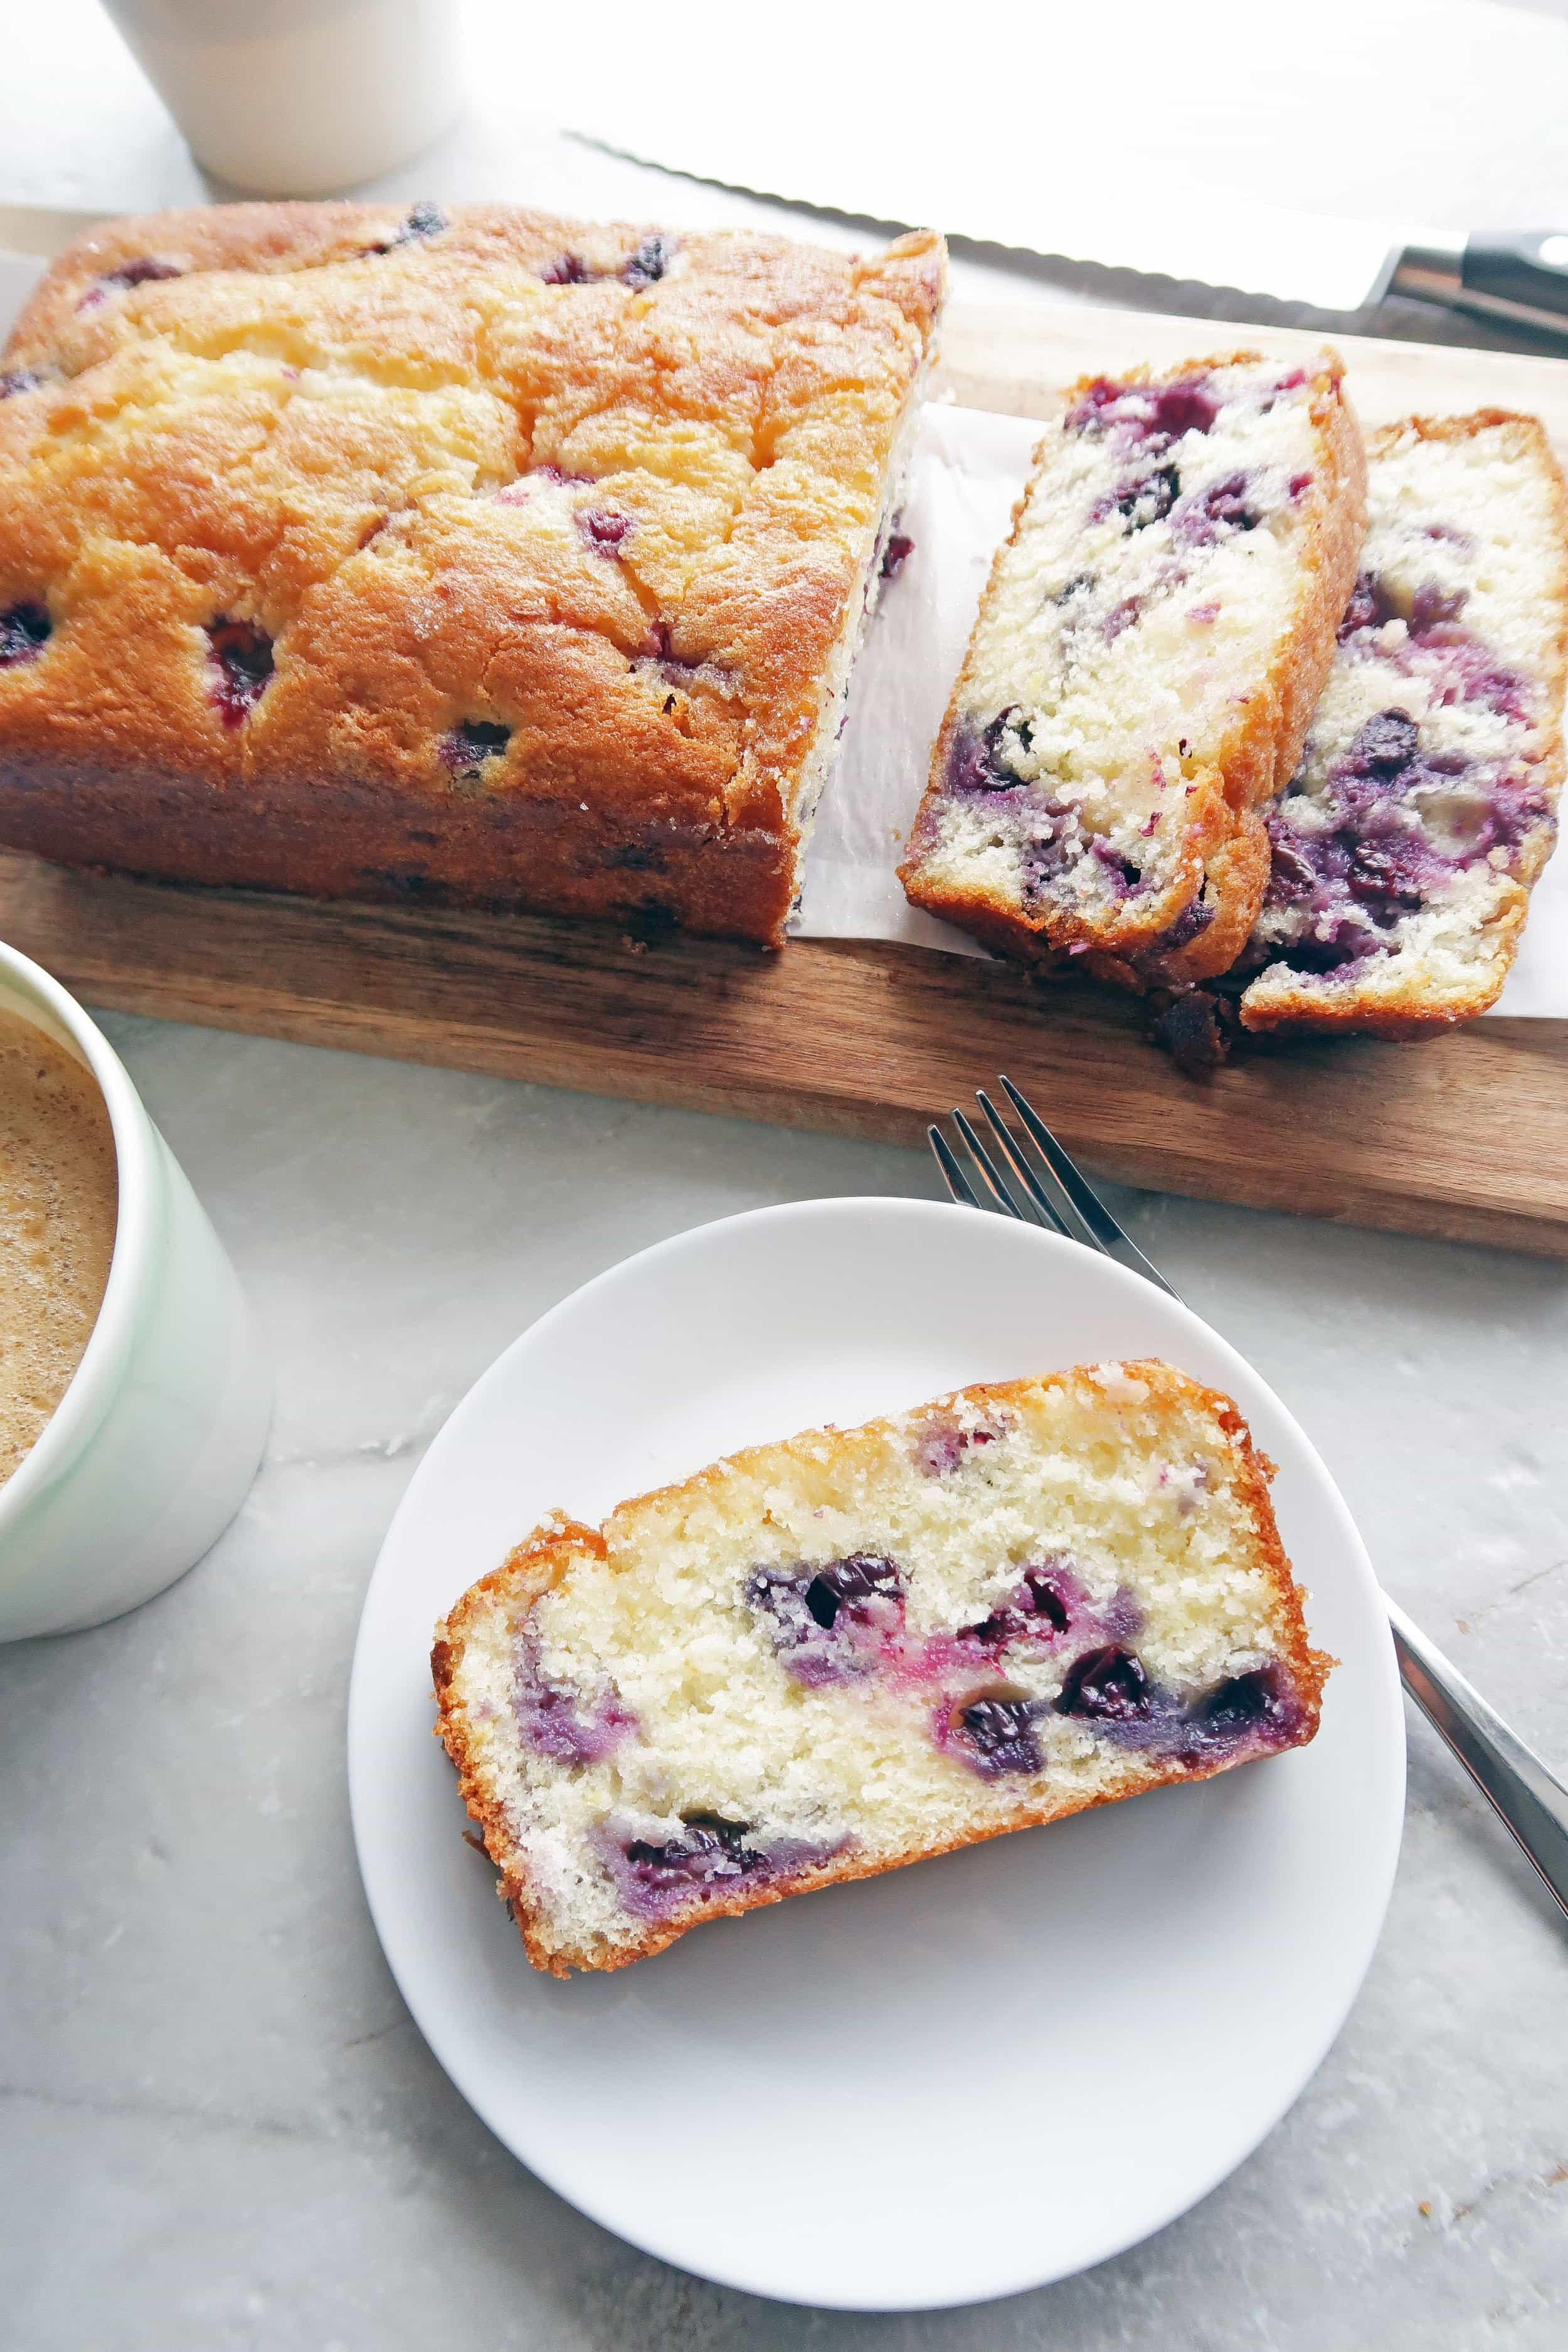 Classic Lemon Blueberry Loaf Cake